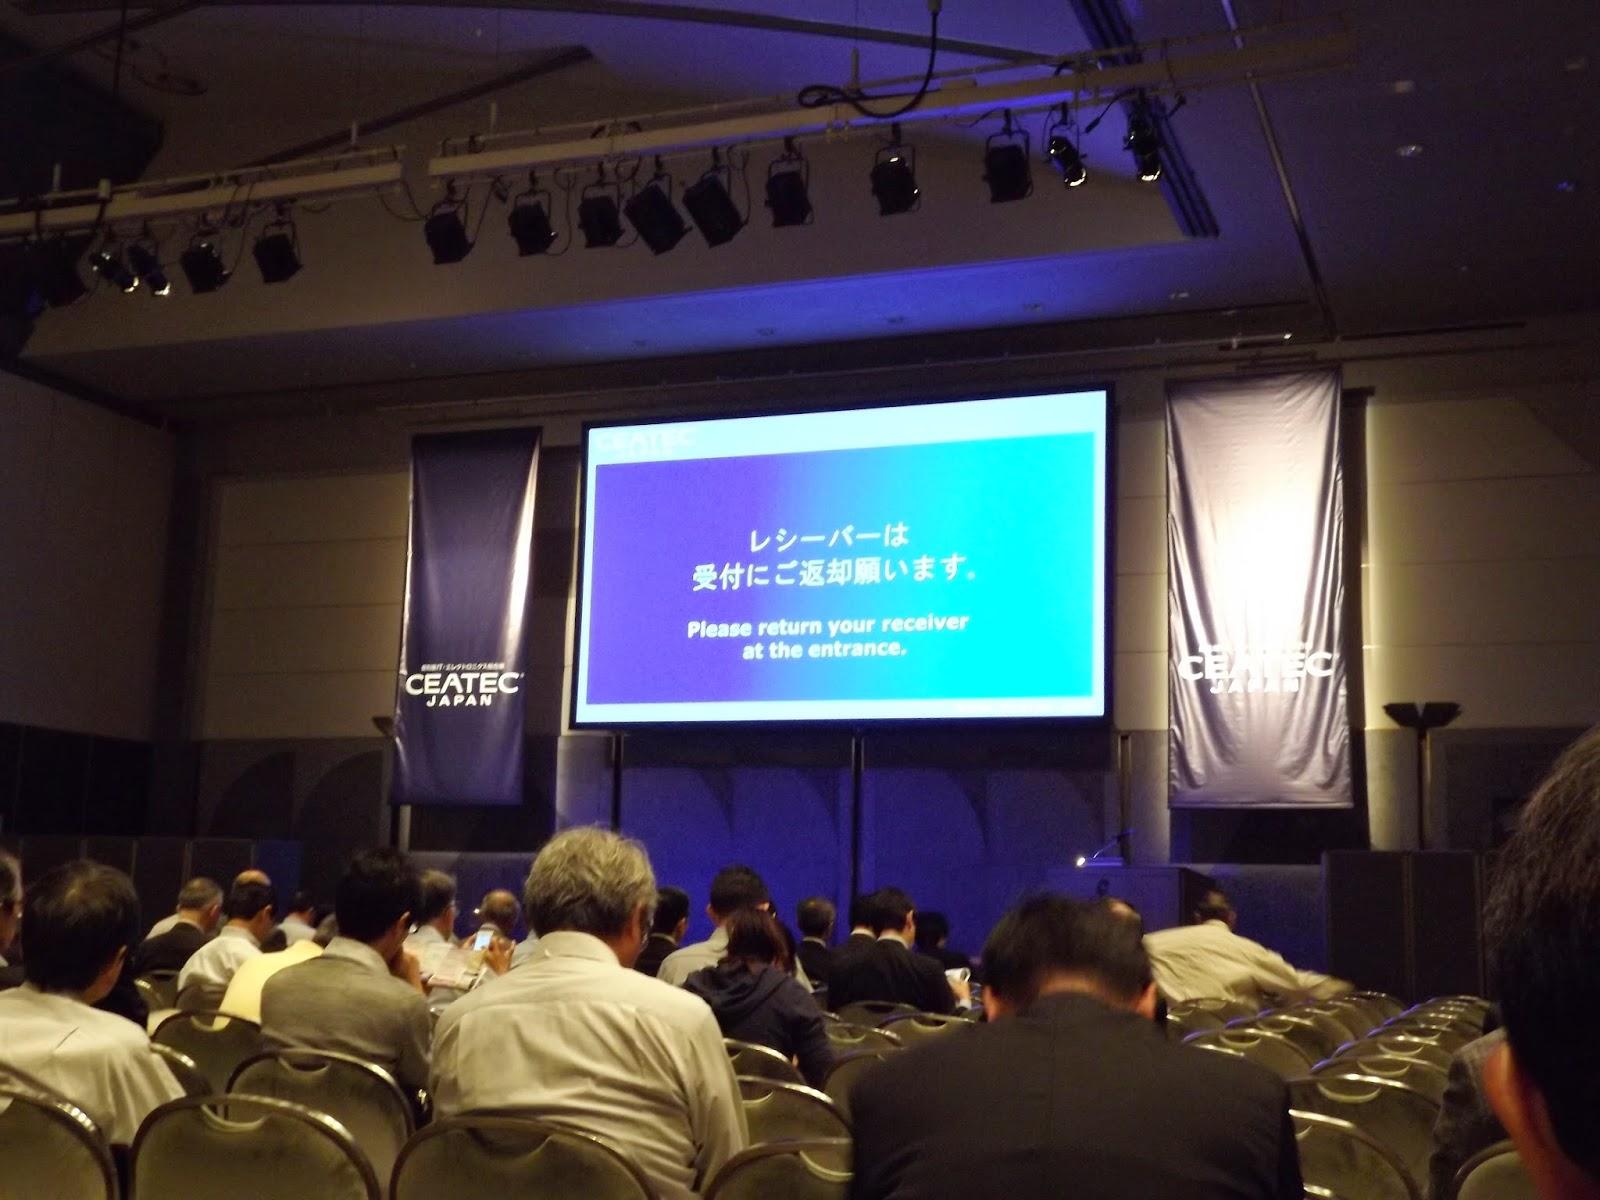 CEATEC JAPAN 2014に行ってきました(基調講演編